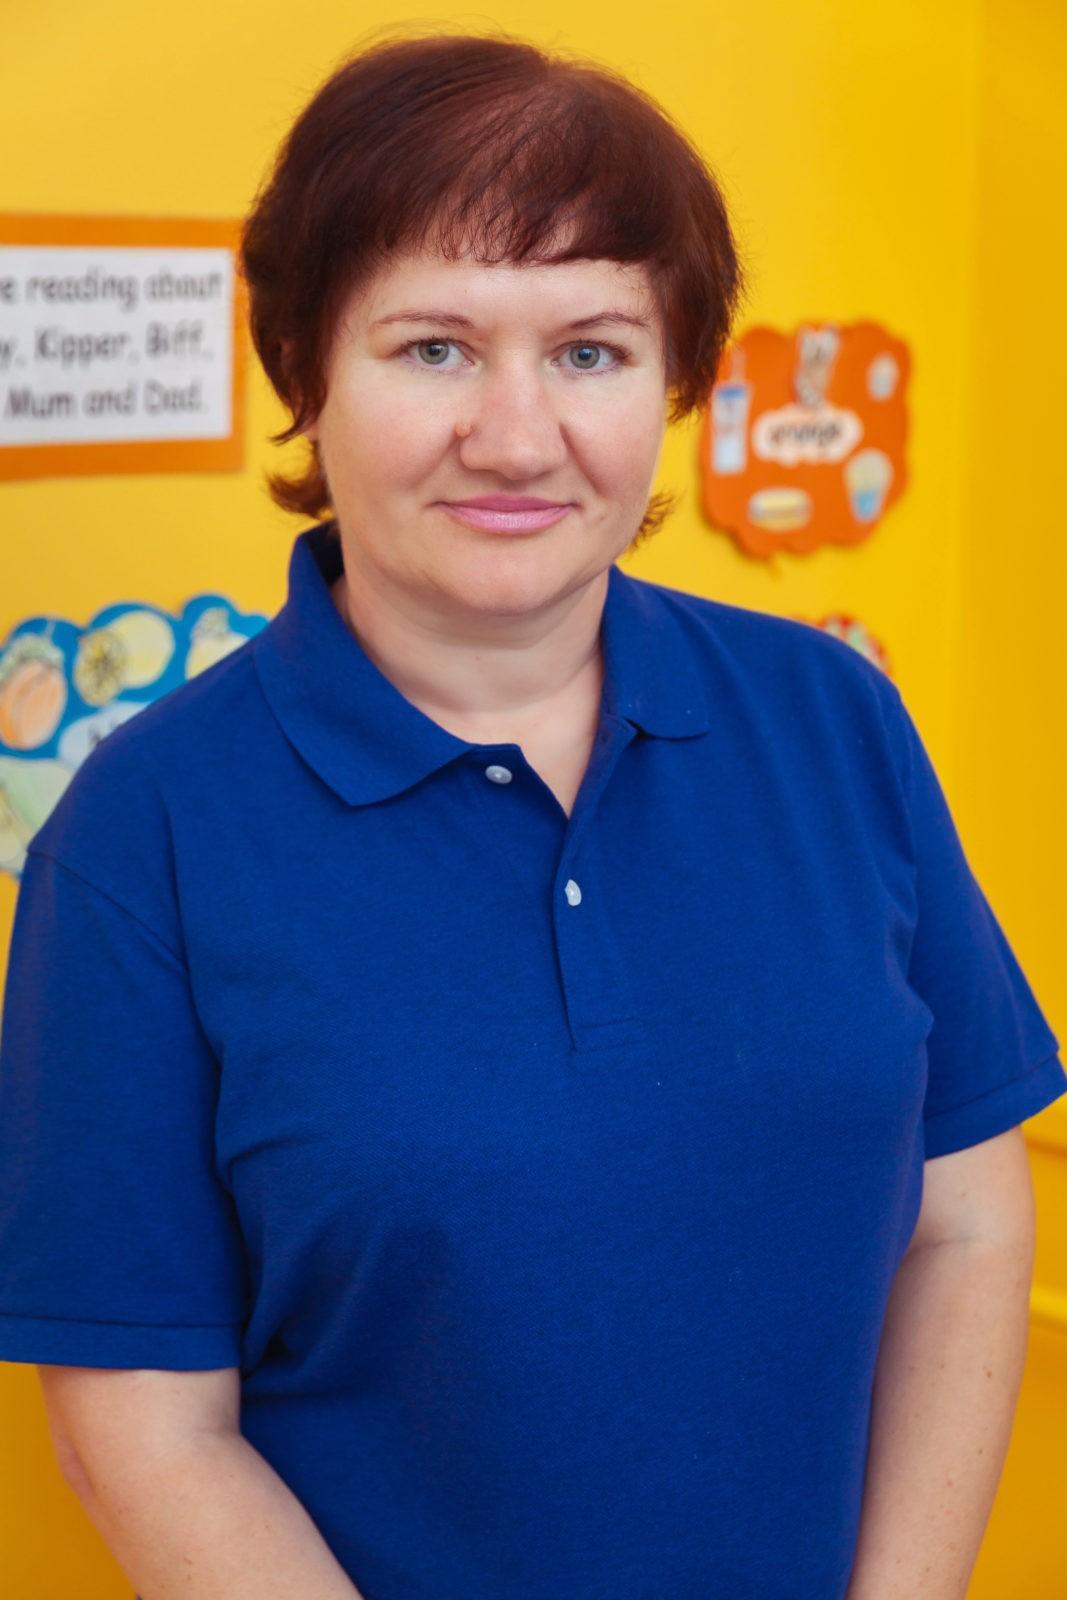 Miss Nanalia Reception teacher